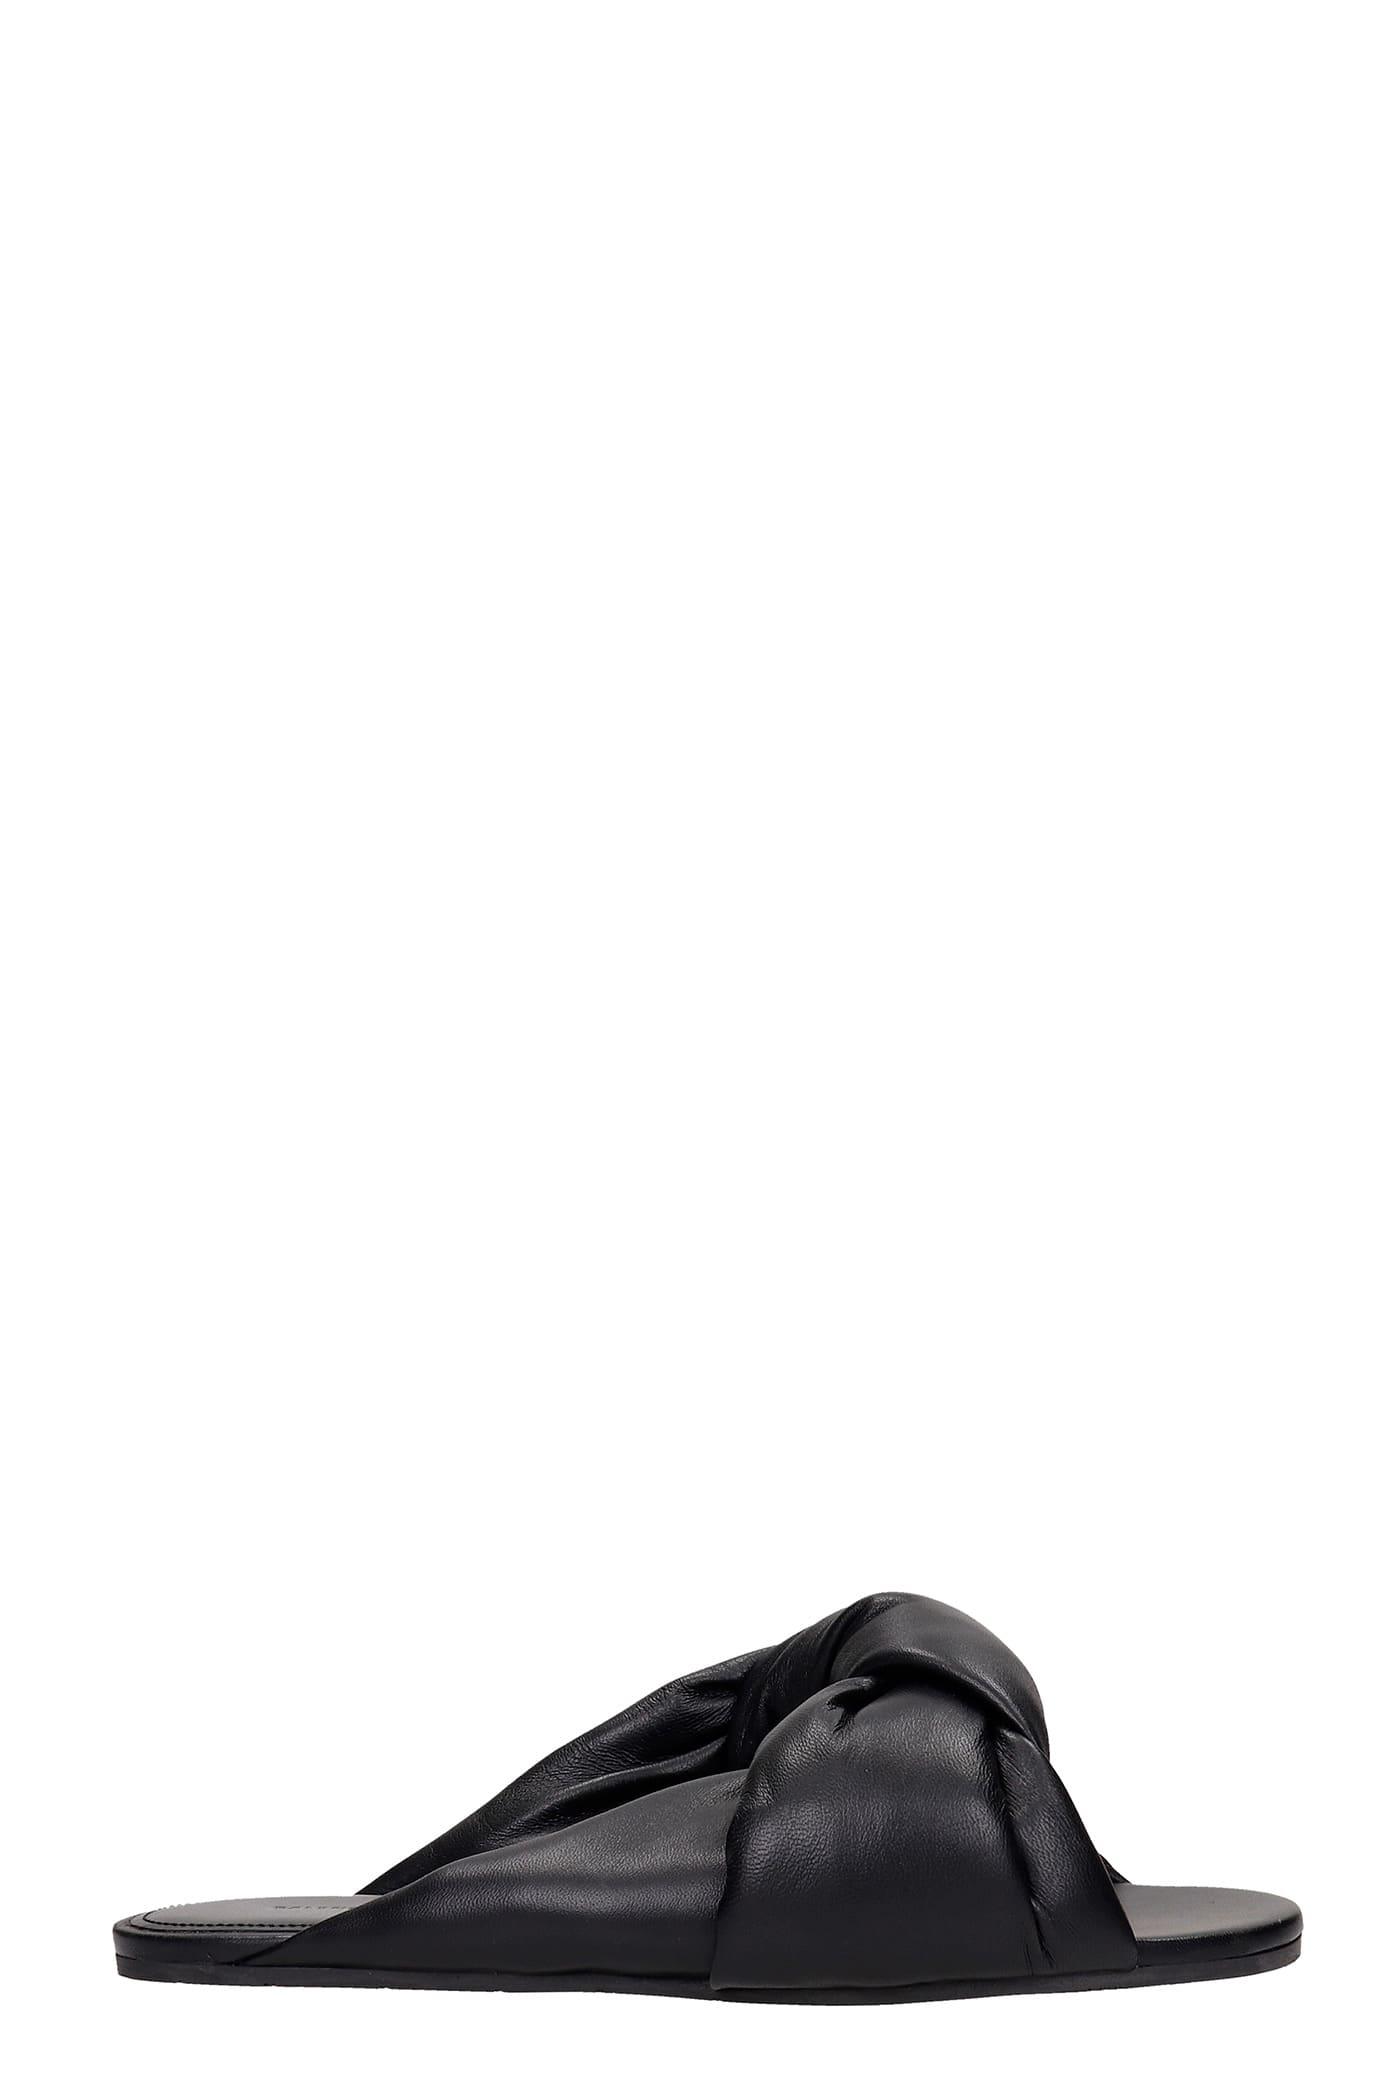 Balenciaga Flats In Black Leather